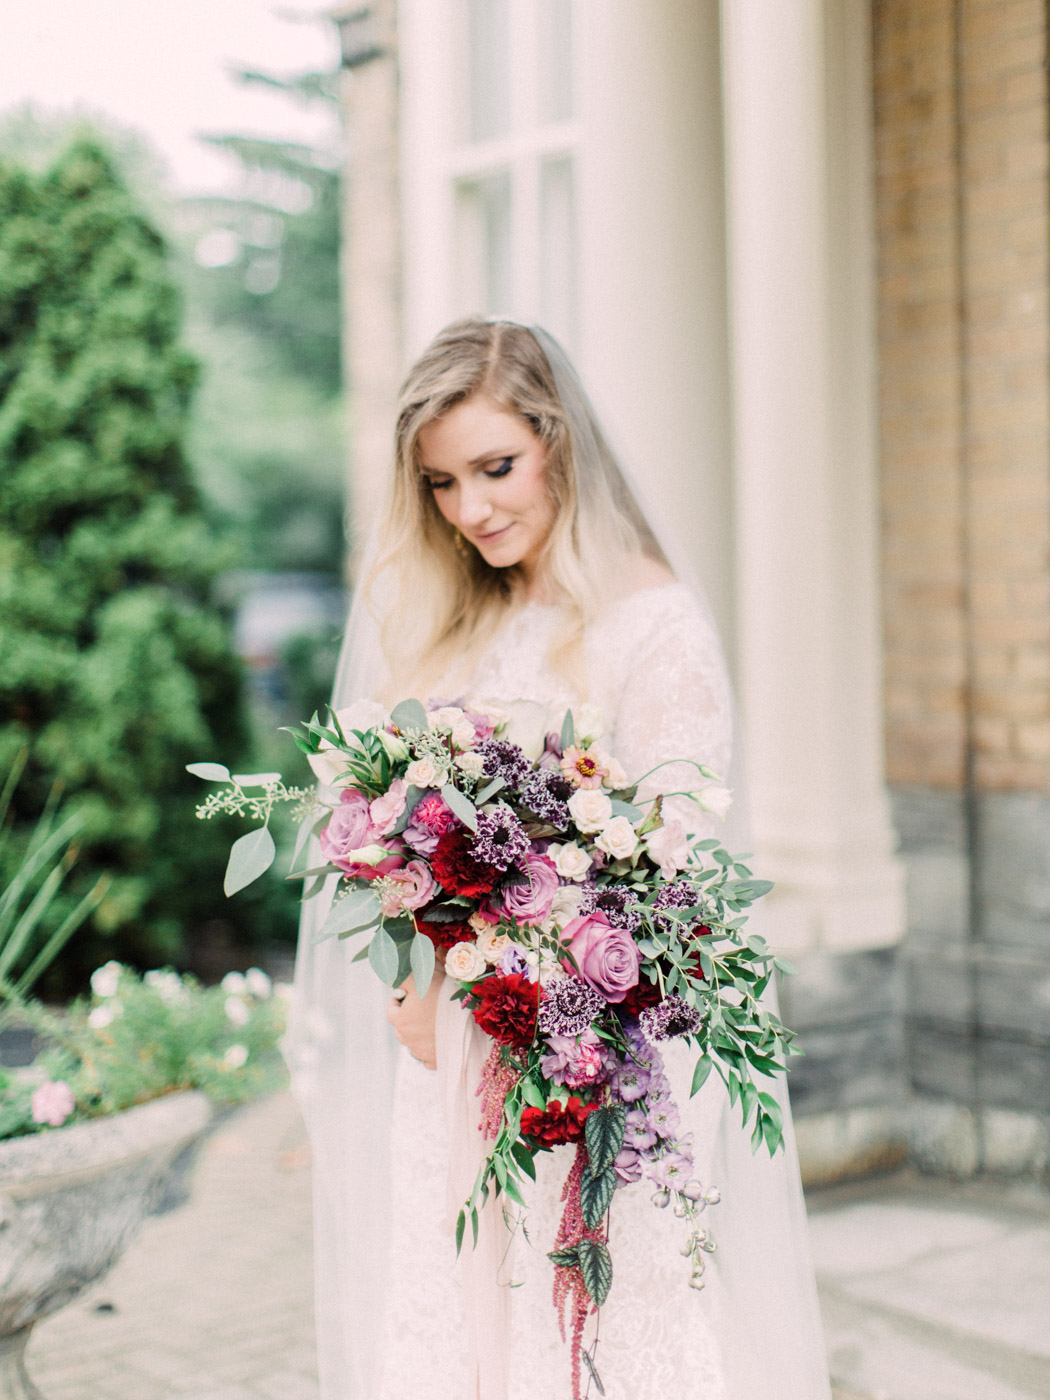 Toronto-wedding-photographer-intimate-classic-fine-art-elopement-ottawa41.jpg